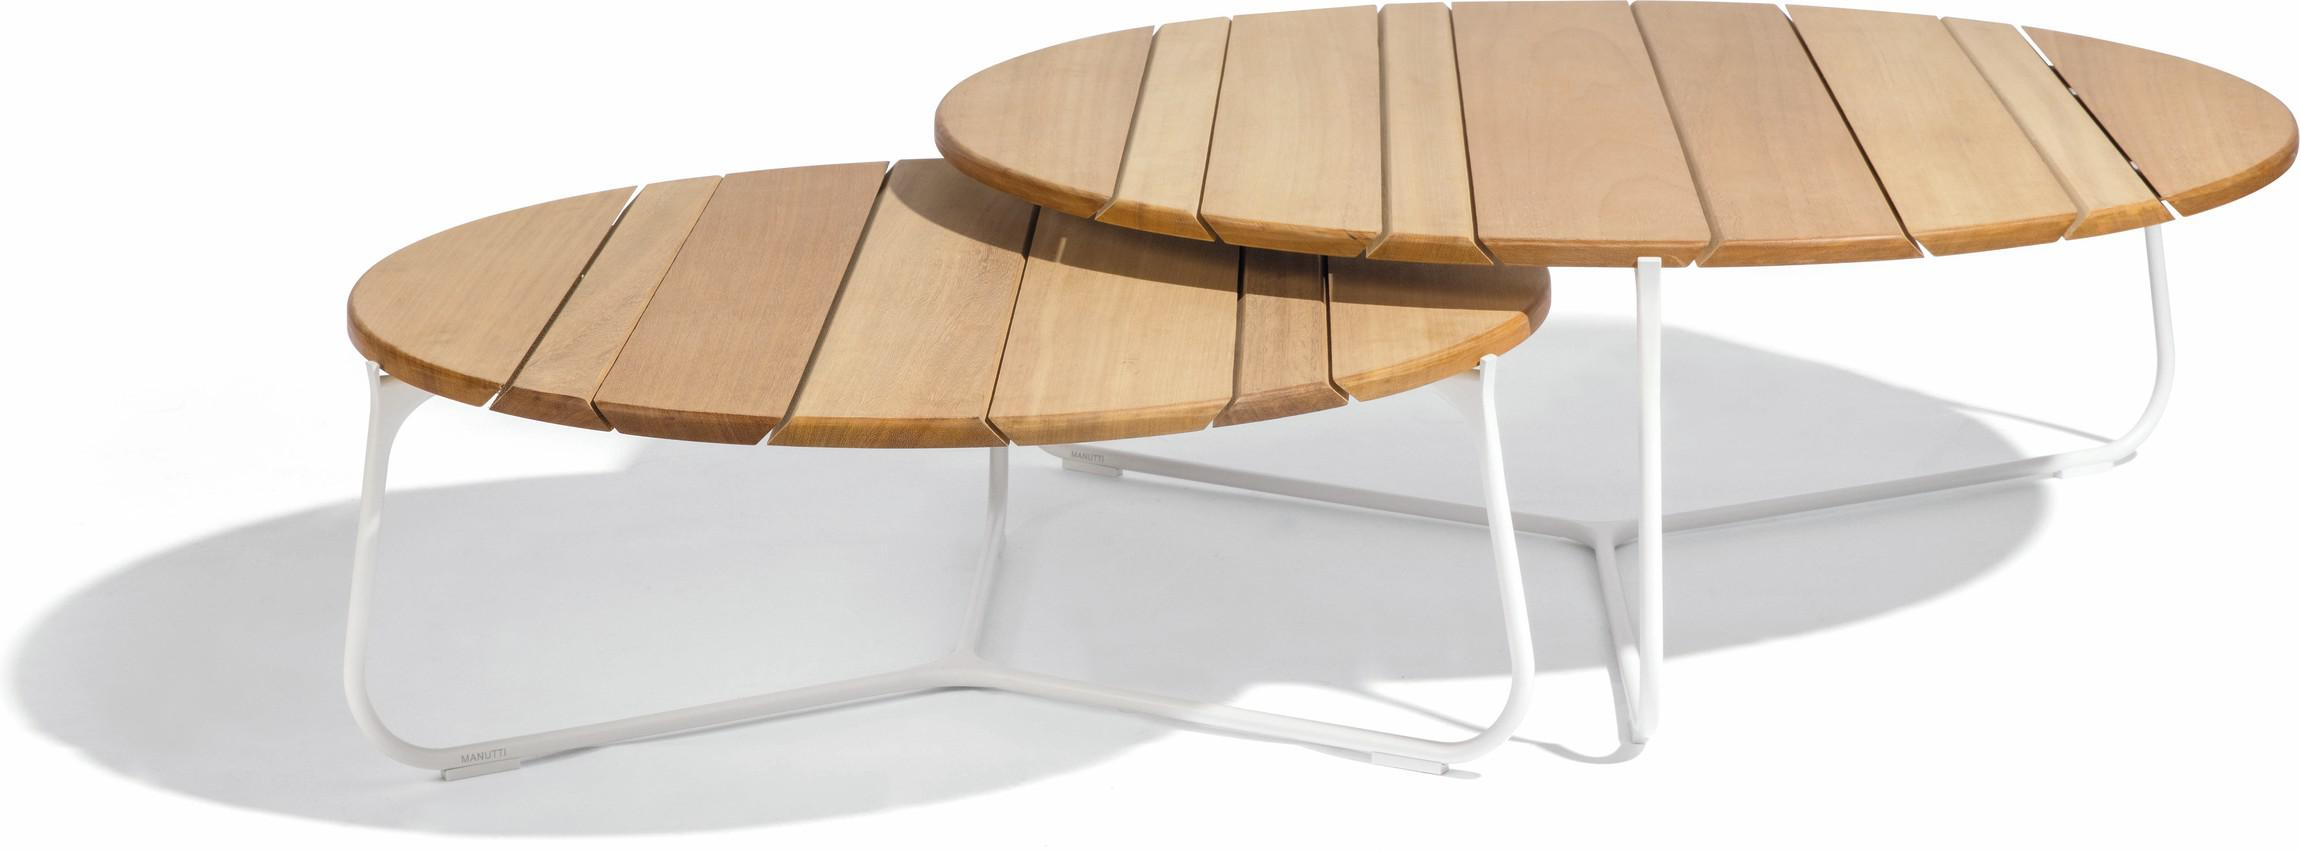 Table basse Mood - blanc - iroko IR - 80